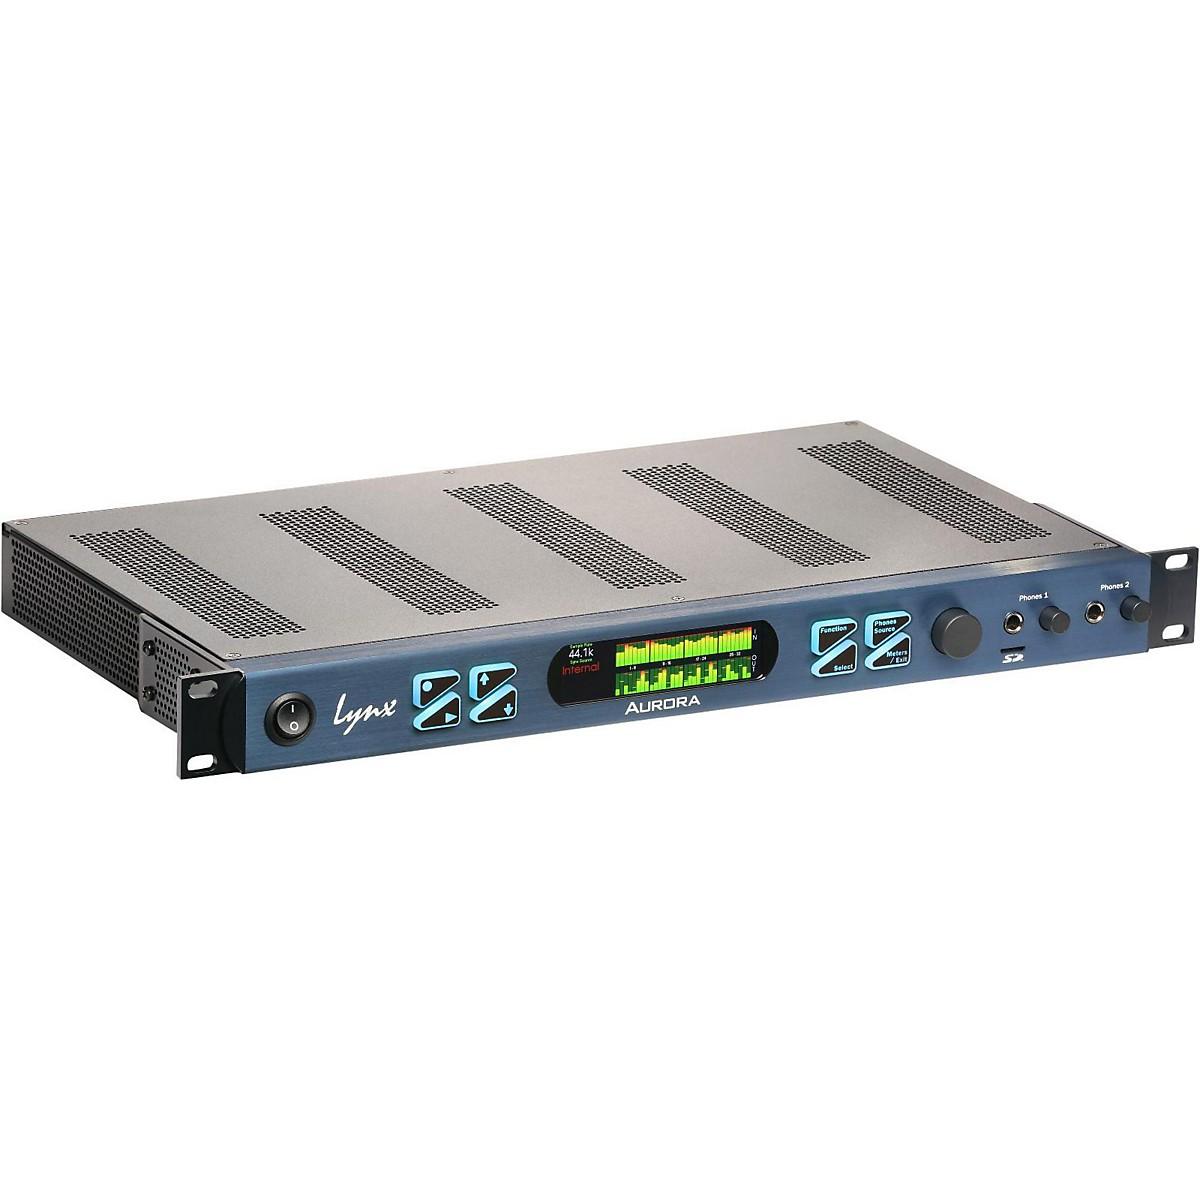 Lynx Aurora(n) 32 Thunderbolt Audio Interface